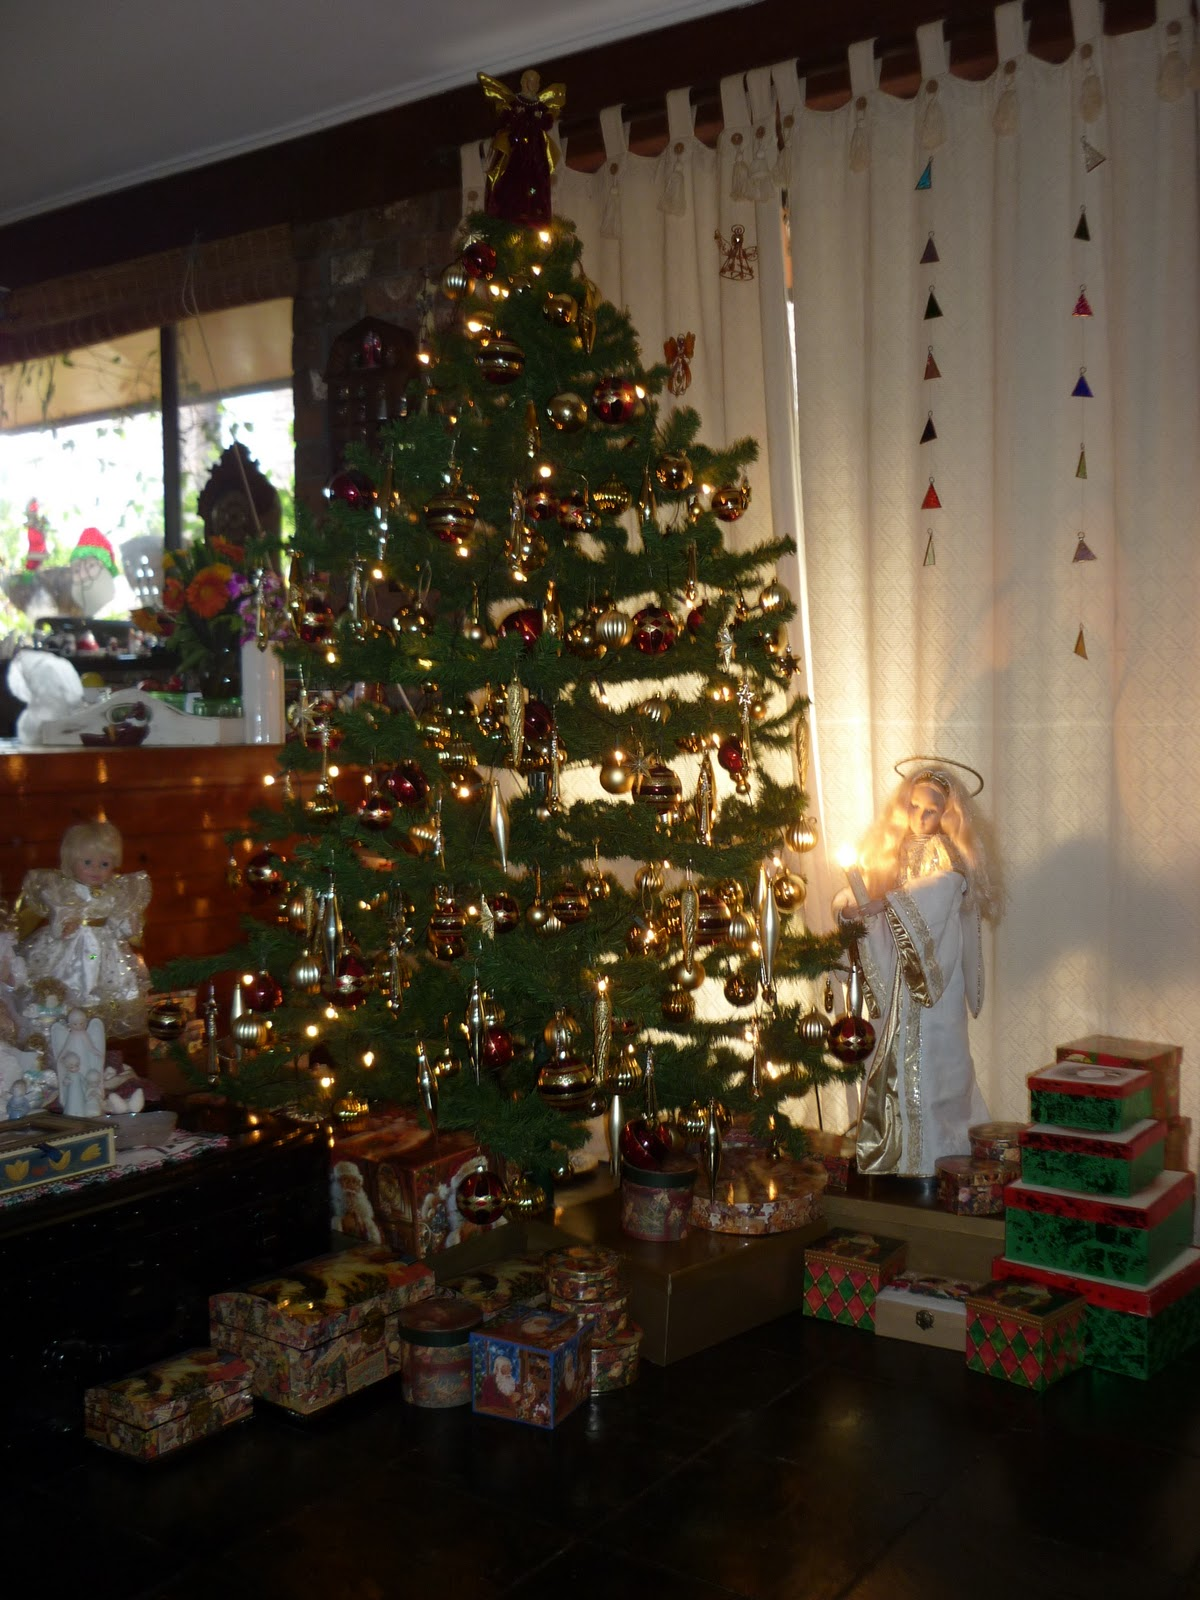 Elfin Stitches My 1970s Christmas Tree